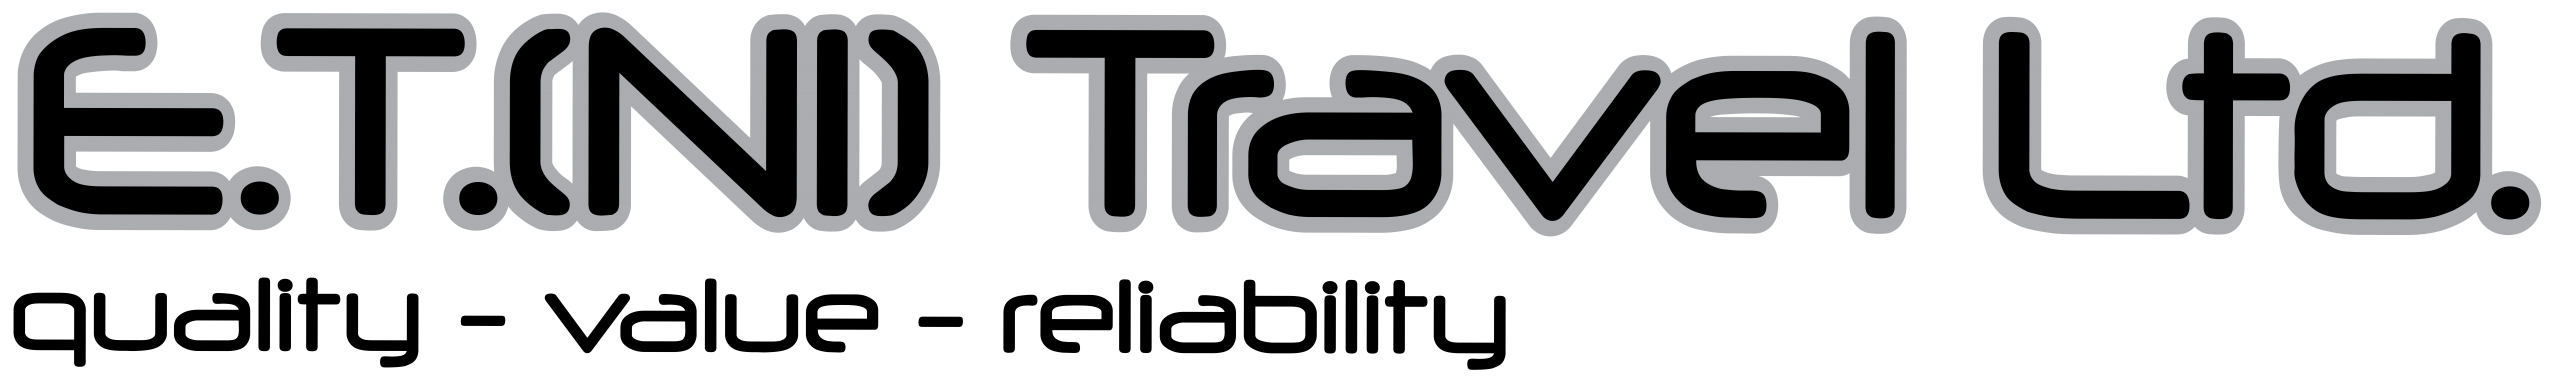 Minibus Hire Magherafelt | ET NI Travel Logo